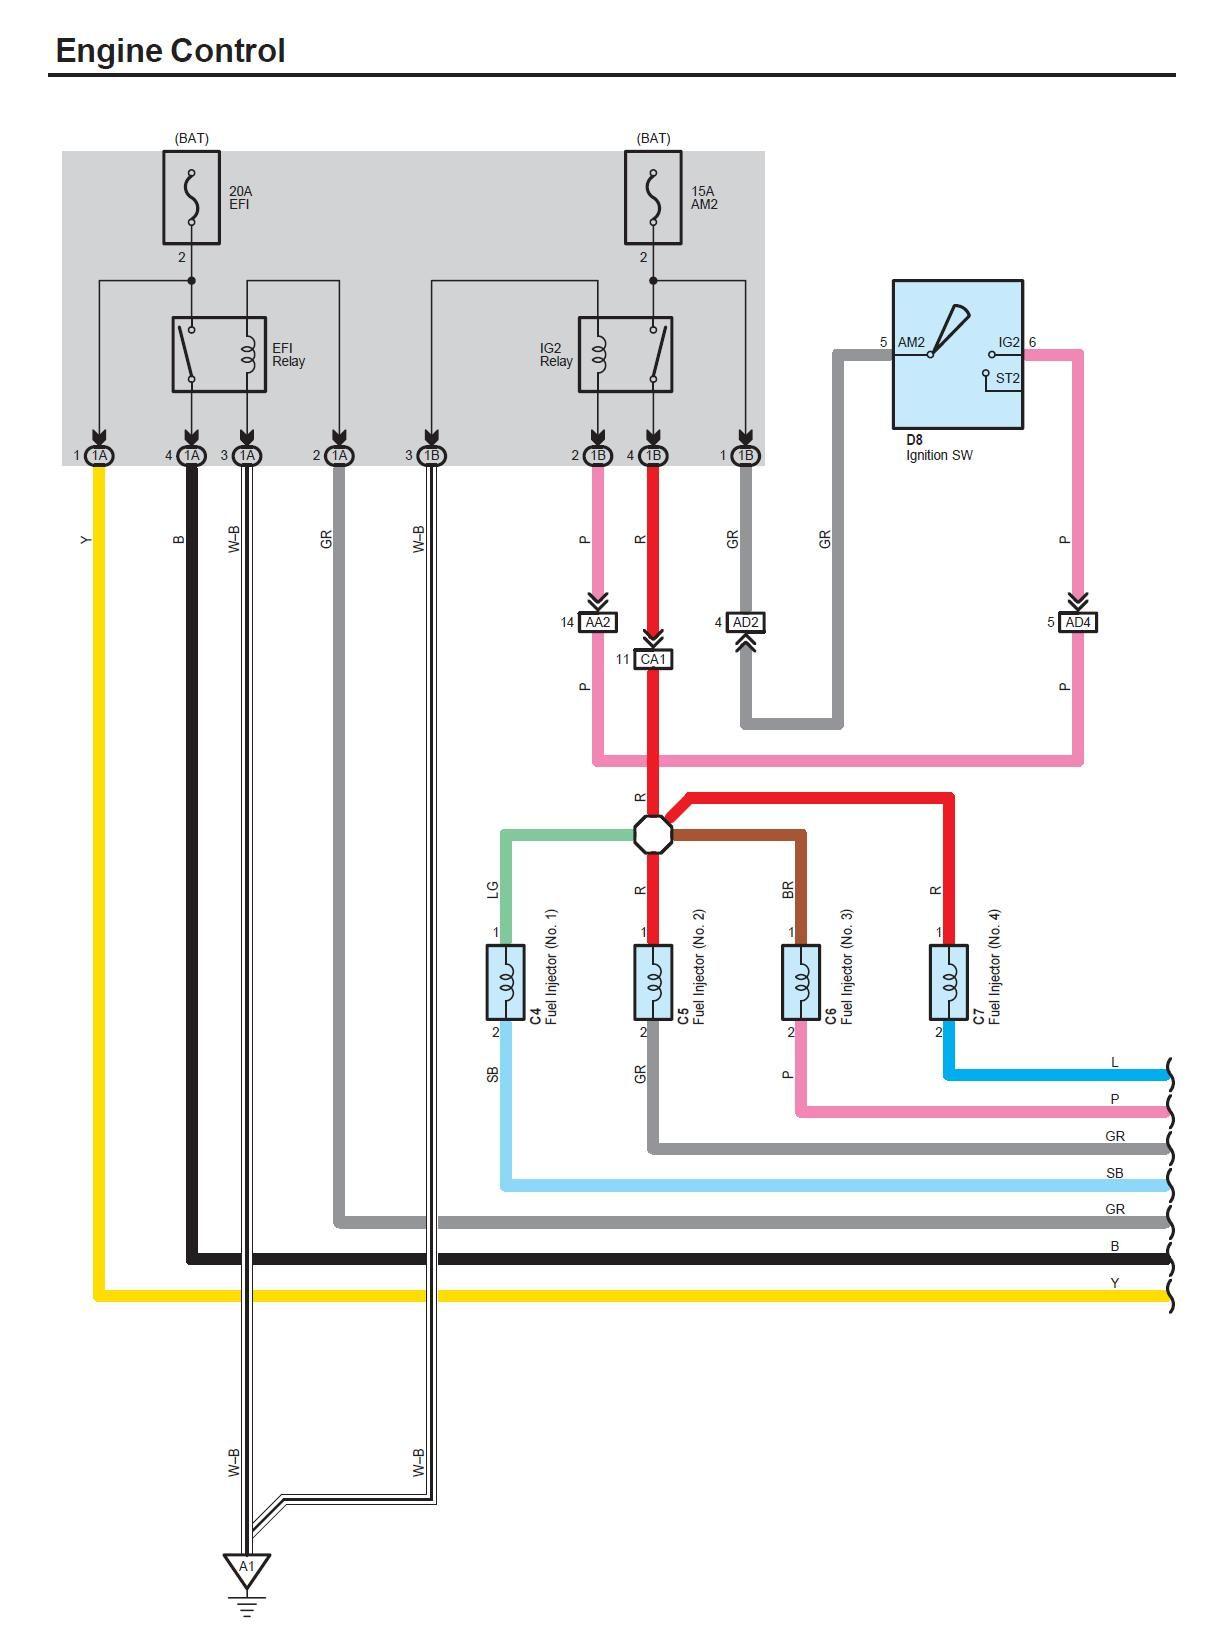 2007 Toyota Yaris Engine Wiring Diagram My Car Parts